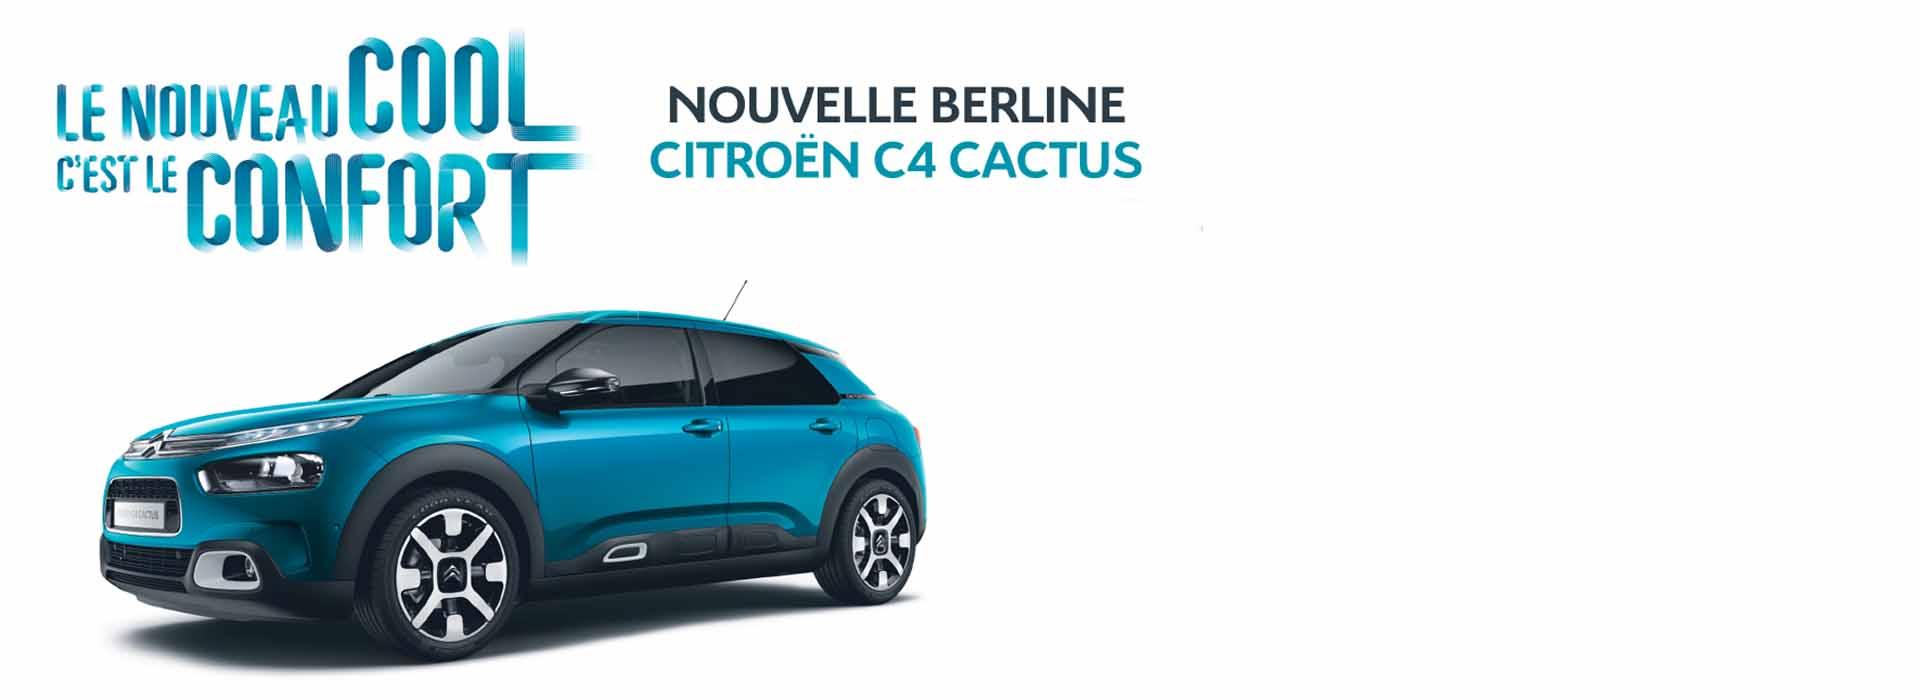 Essai citroen c4 cactus citro n chartres - Reparation telephone chartres ...